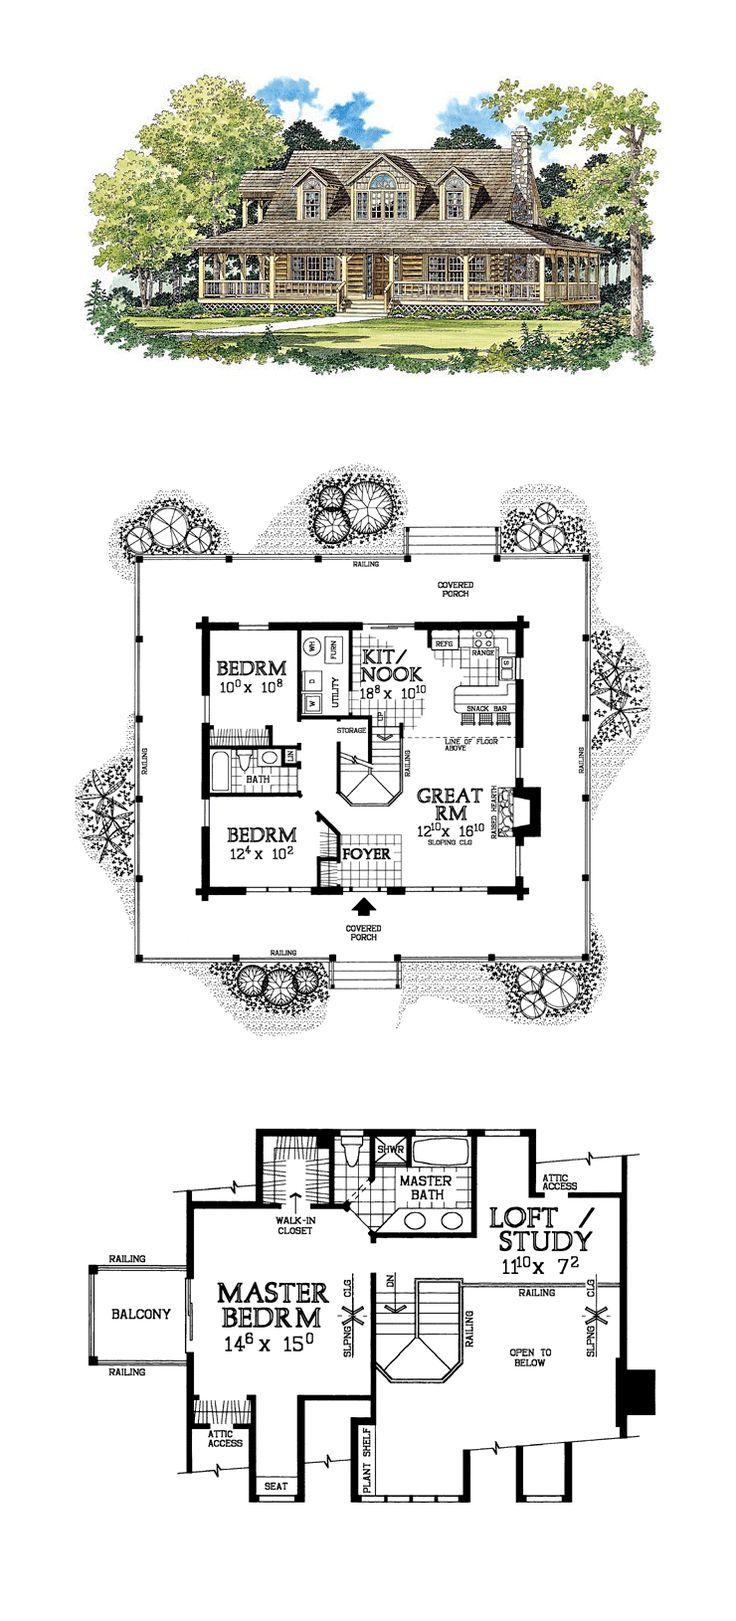 17 best images about log home plans on pinterest decks for Log siding house plans